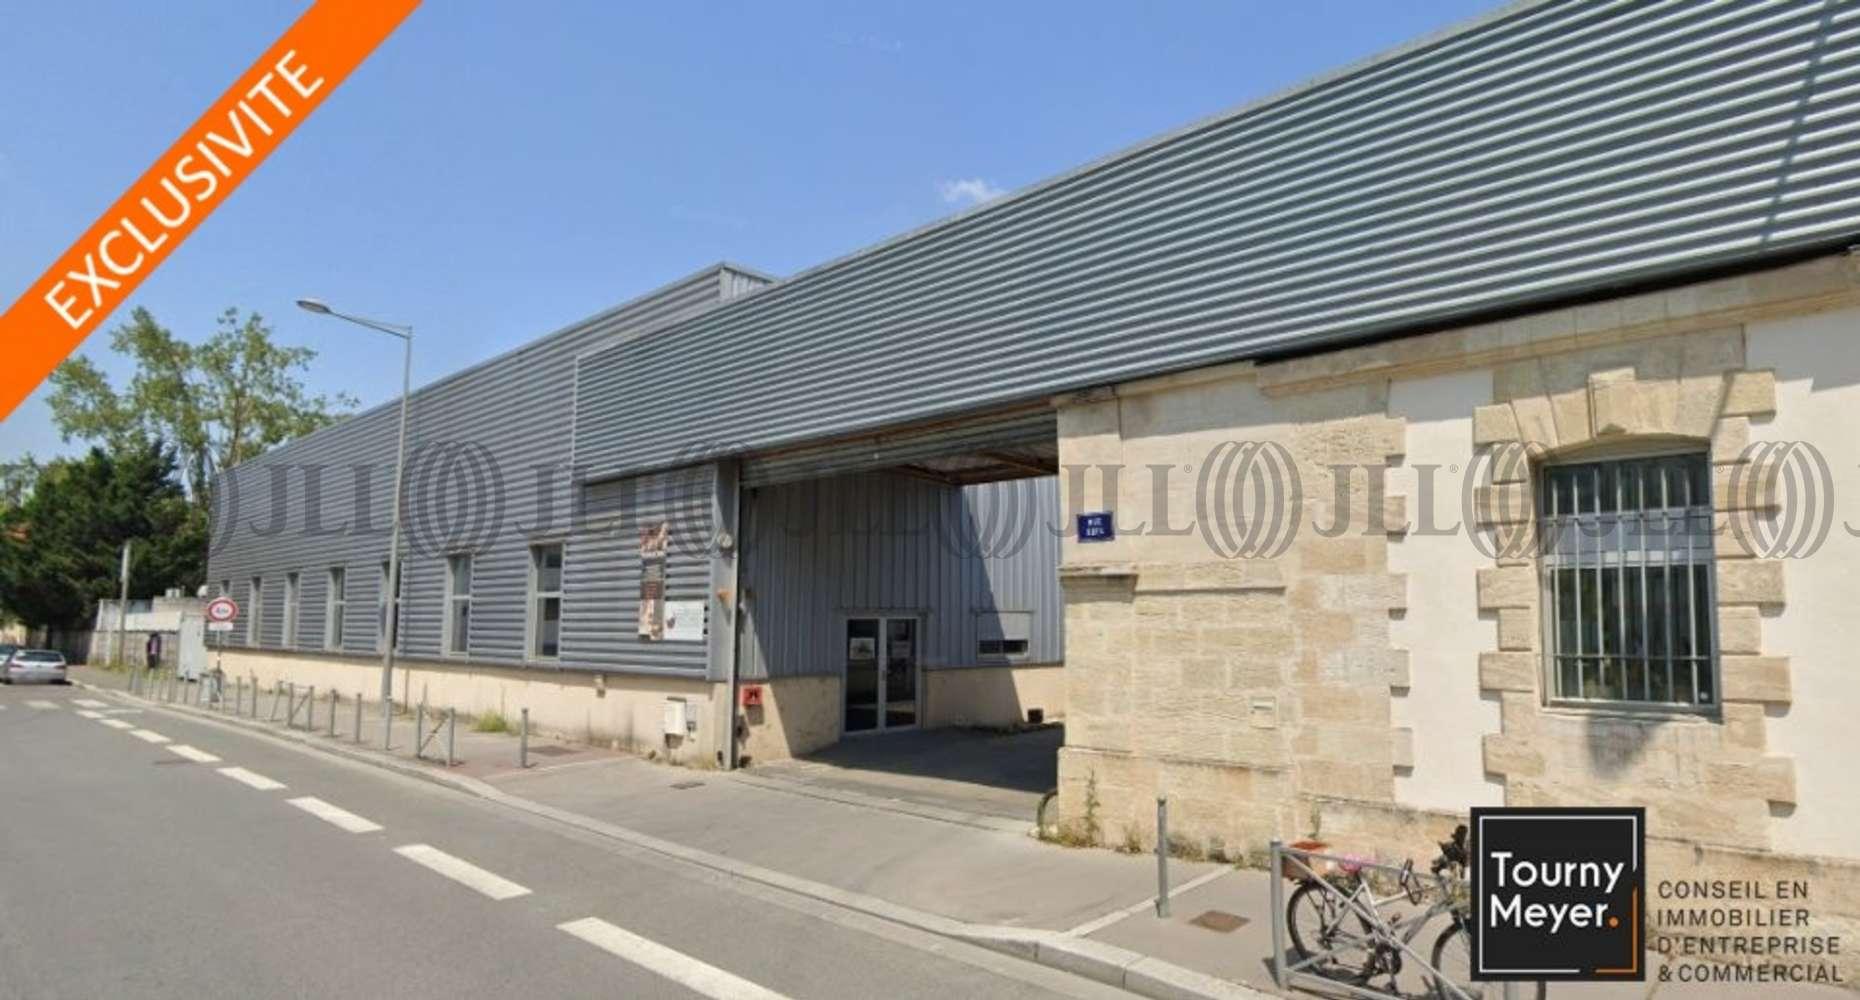 Activités/entrepôt Bordeaux, 33800